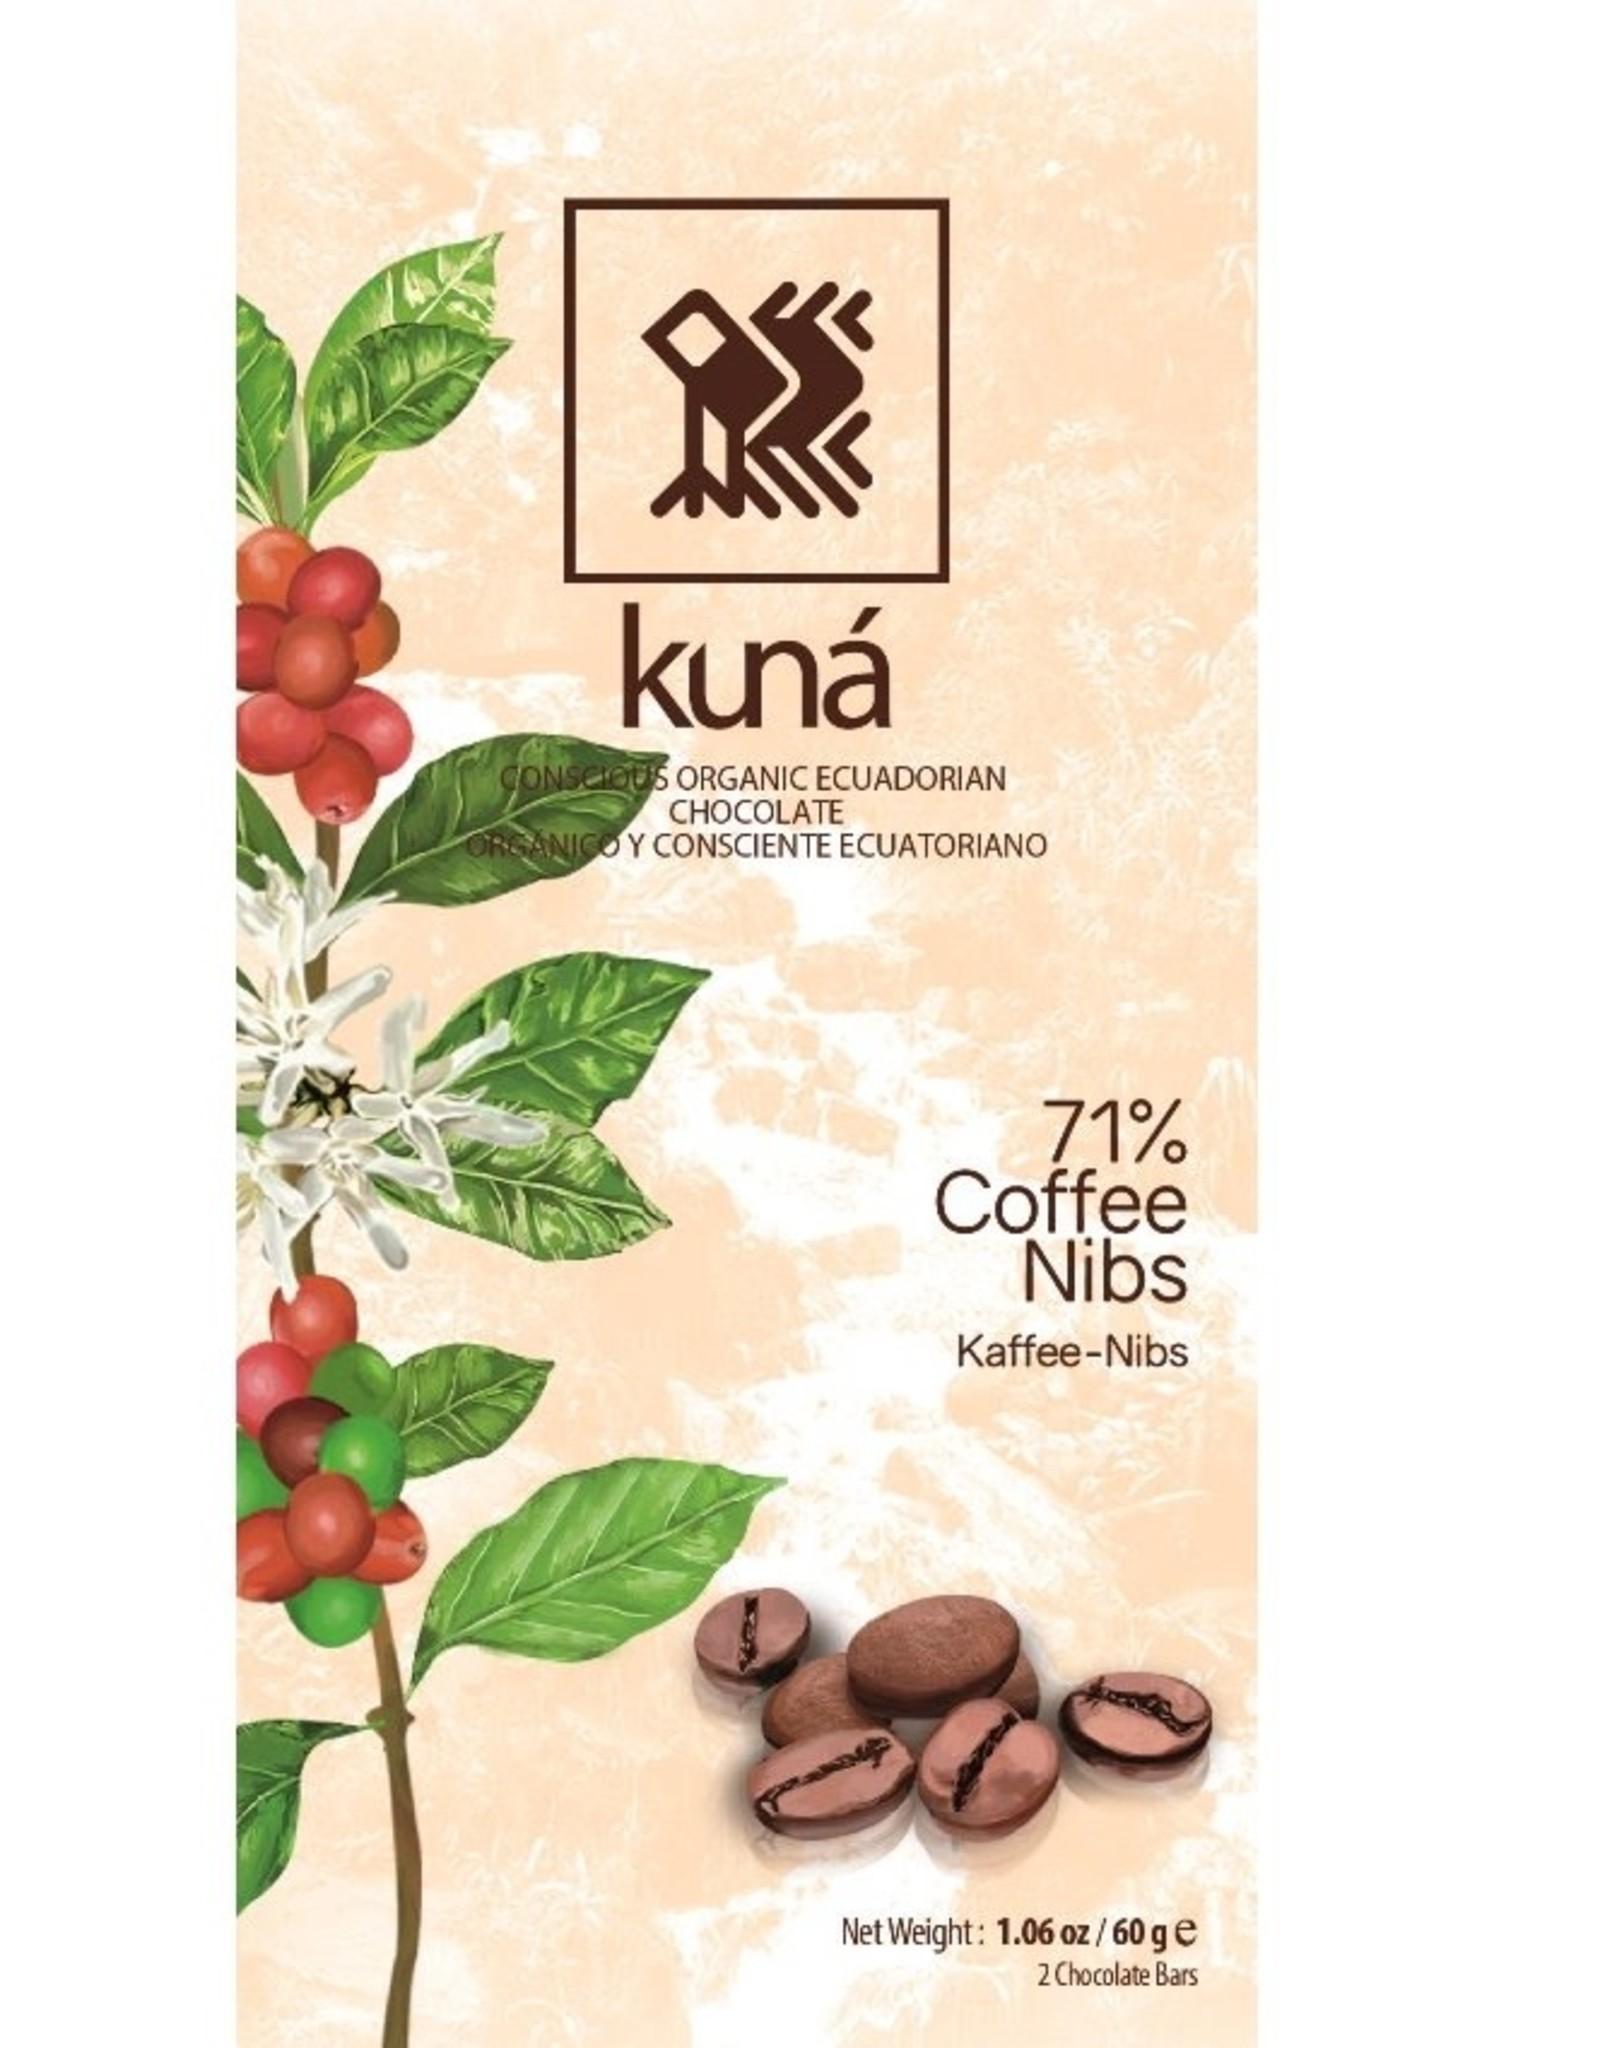 KUNÁ, Ecuador Kuná Coffee Nibs